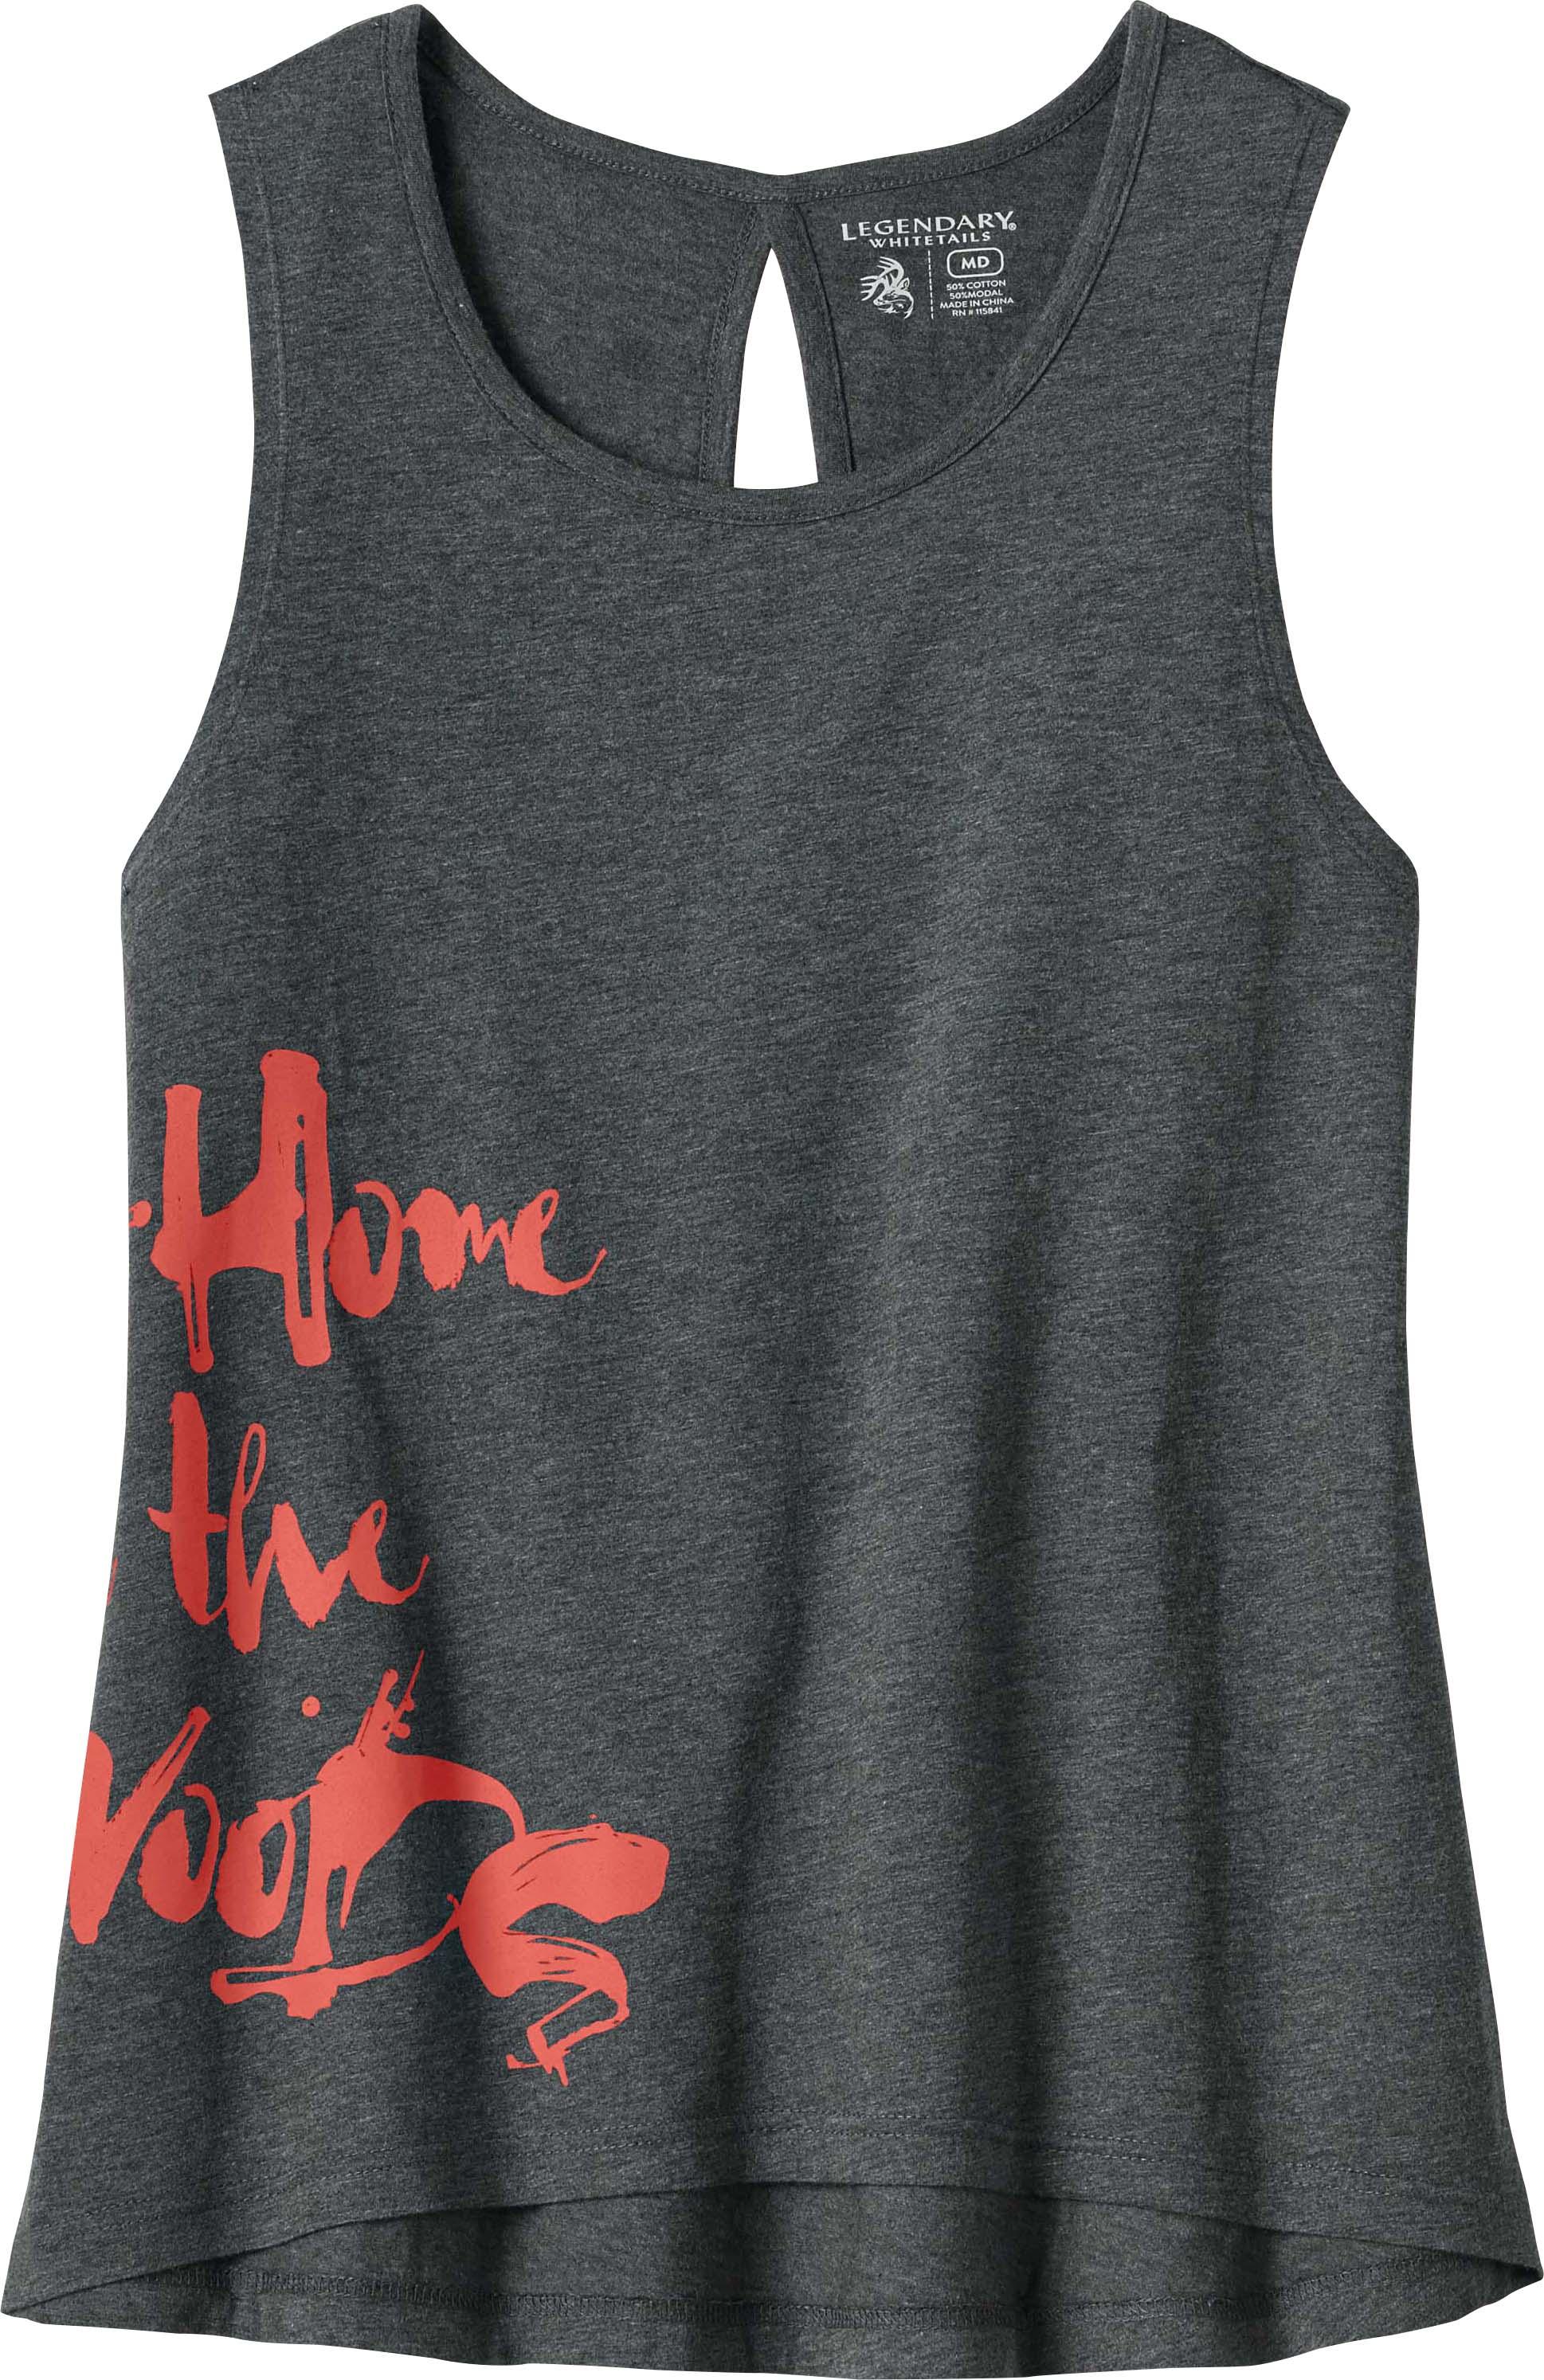 56c68ee23b00d Women s In The Woods Sleeveless T-shirt ...